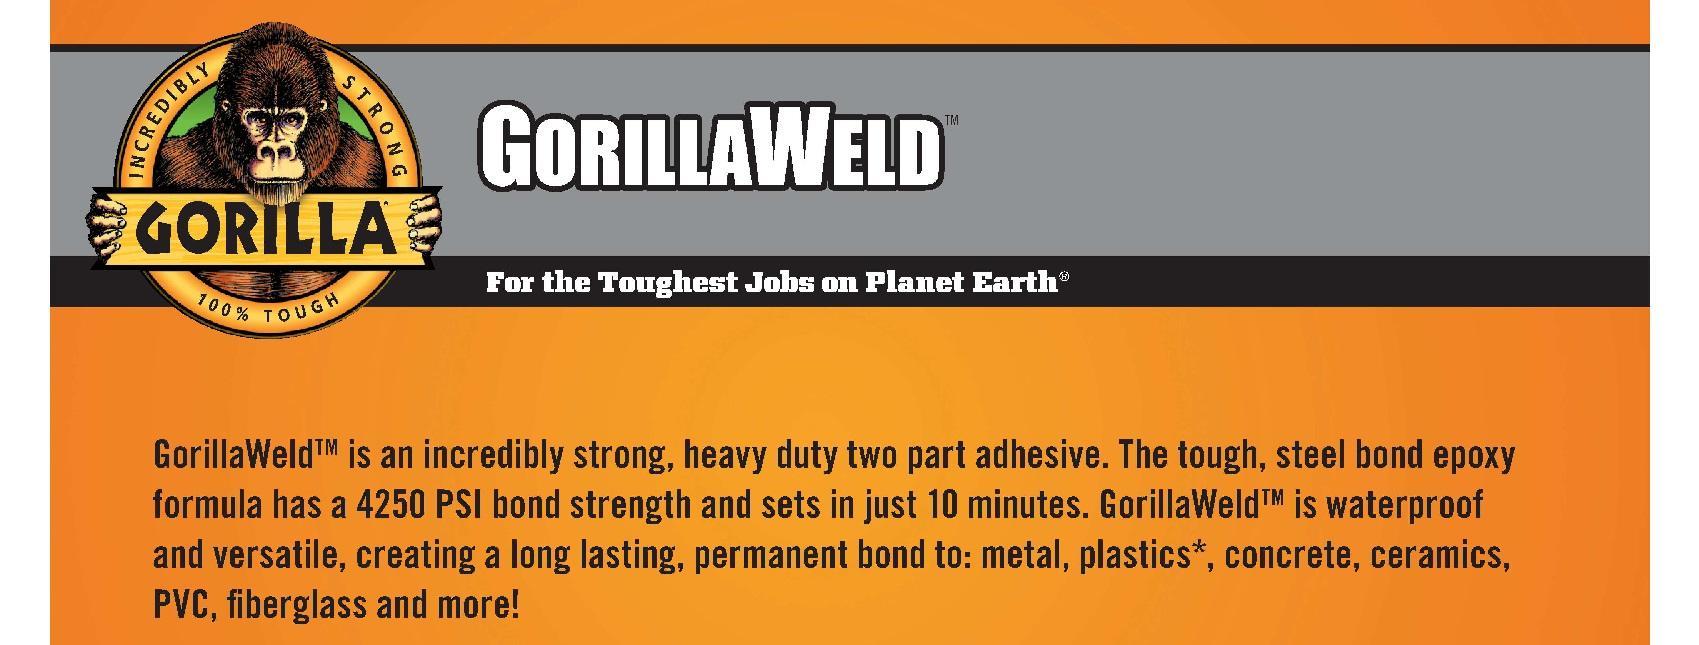 Gorilla Heavy Duty Gorillaweld Steel Bond 2 Part Epoxy Resin 280 Gram View Larger